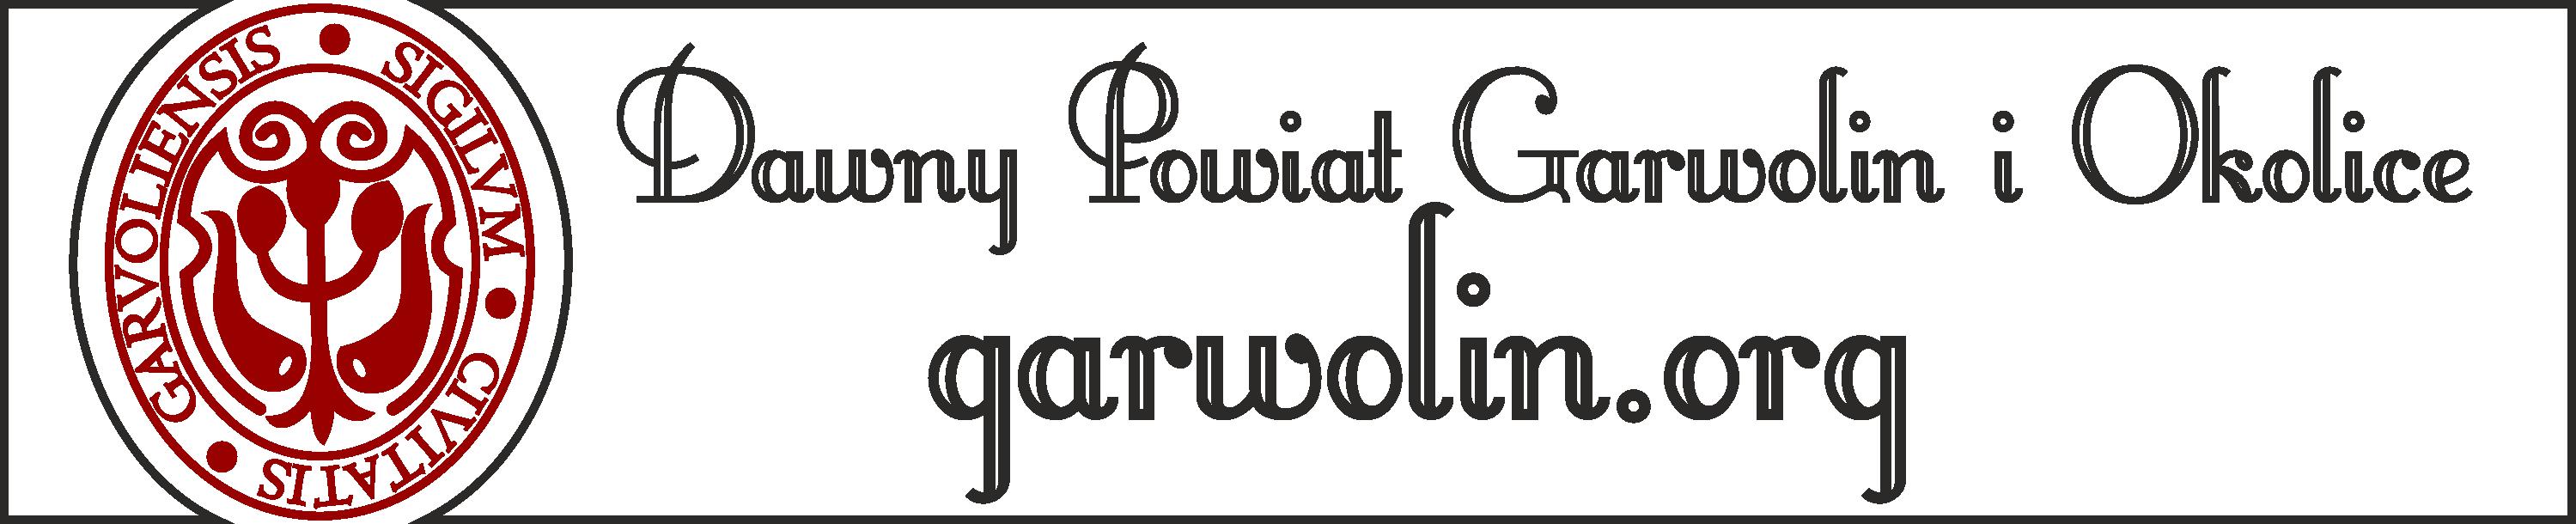 Galeria fotografii | Garwolin.org | Dawny Powiat Garwolin i Okolice